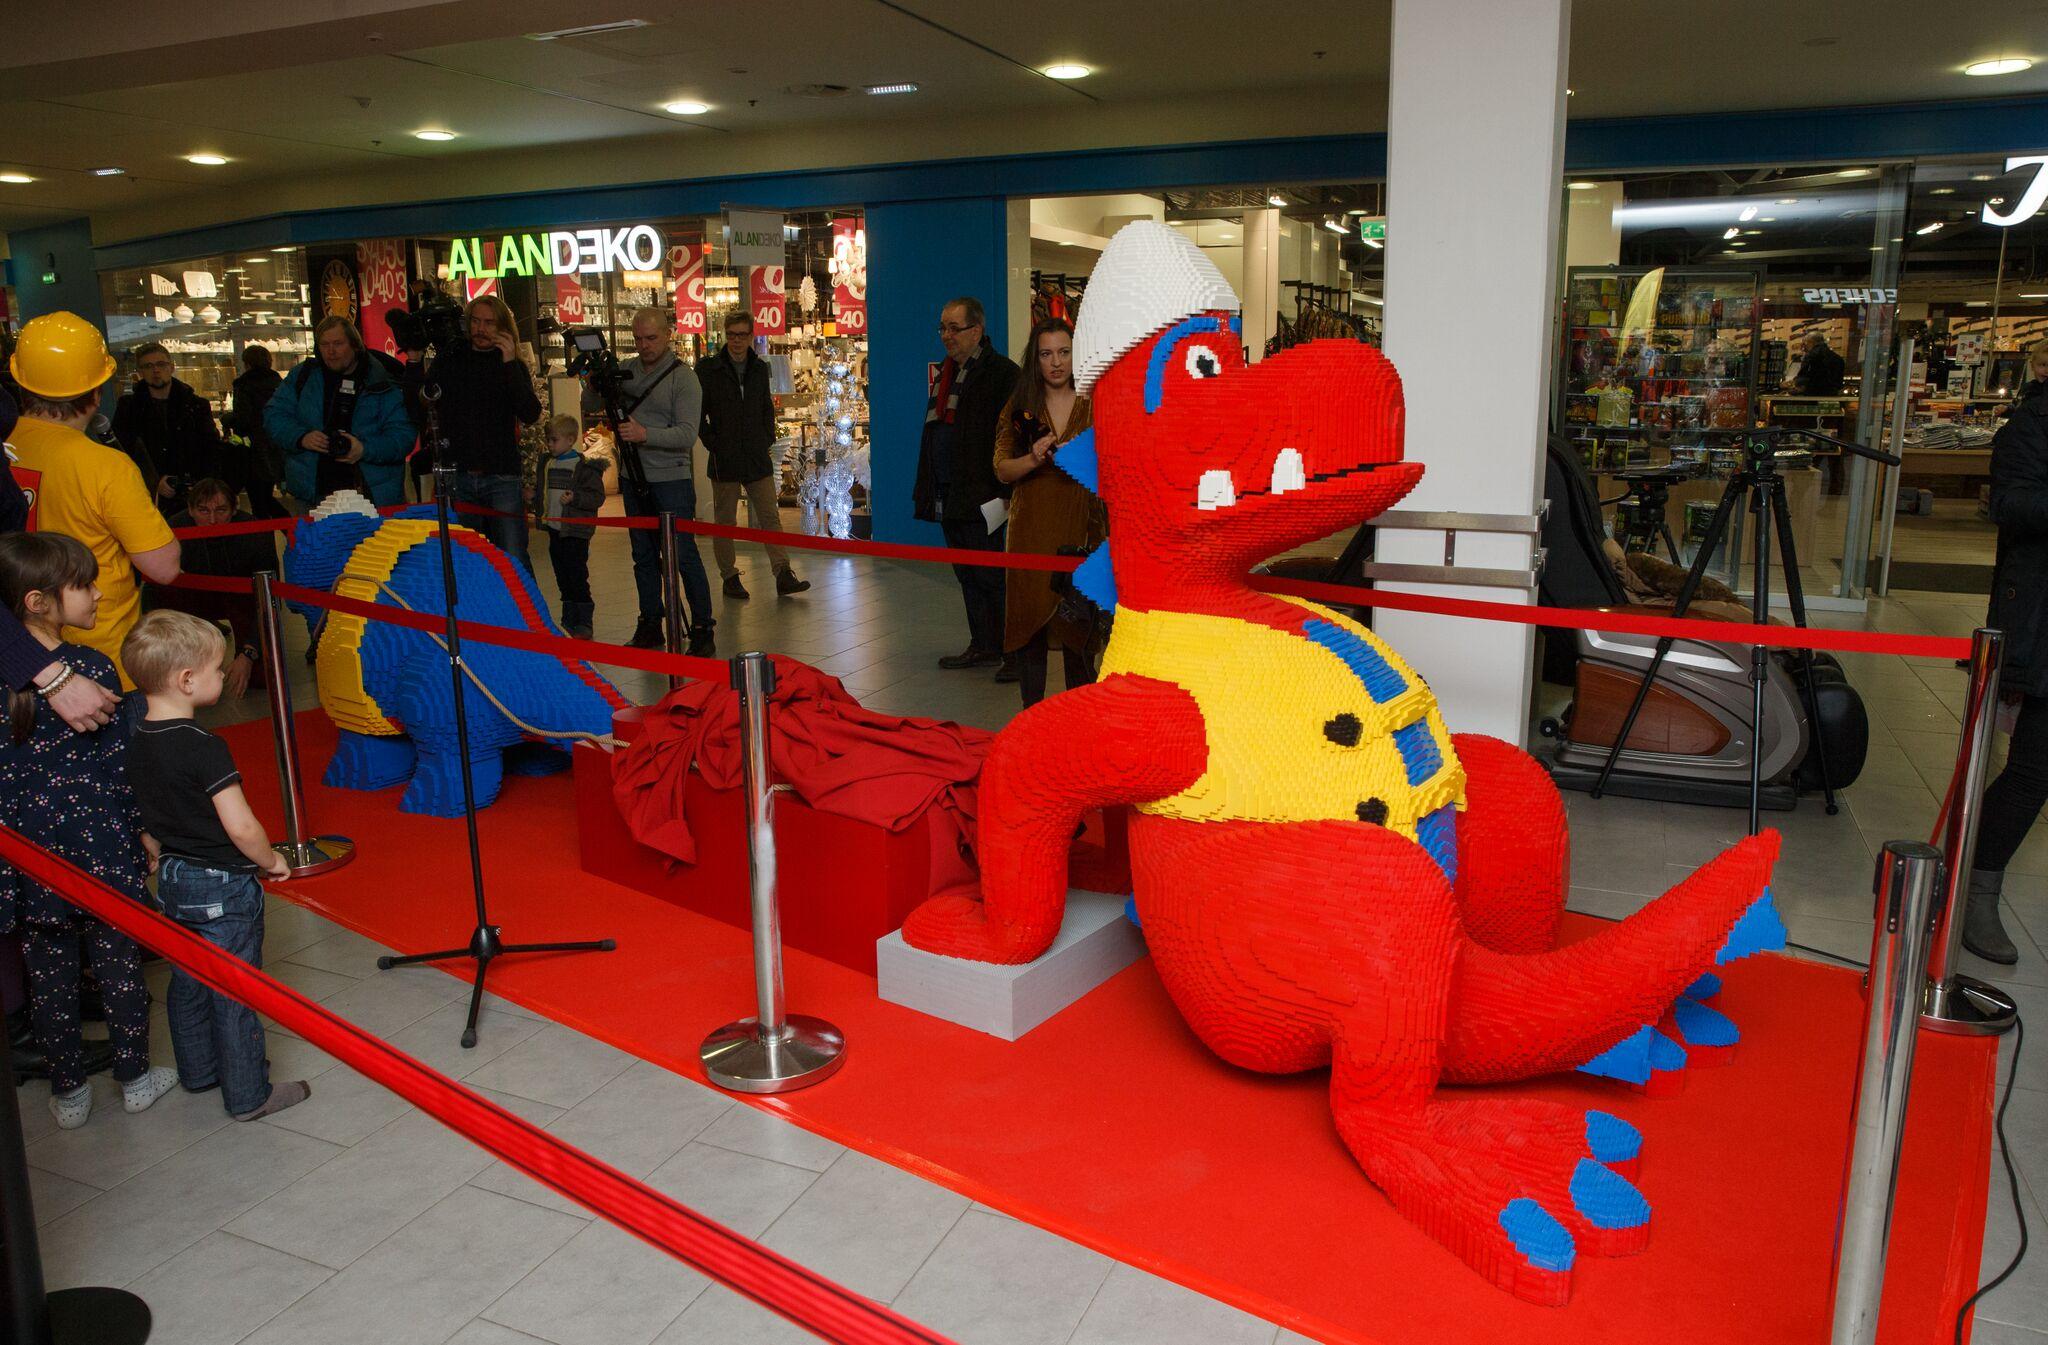 Galerii! Tallinnas avatu LEGO festival